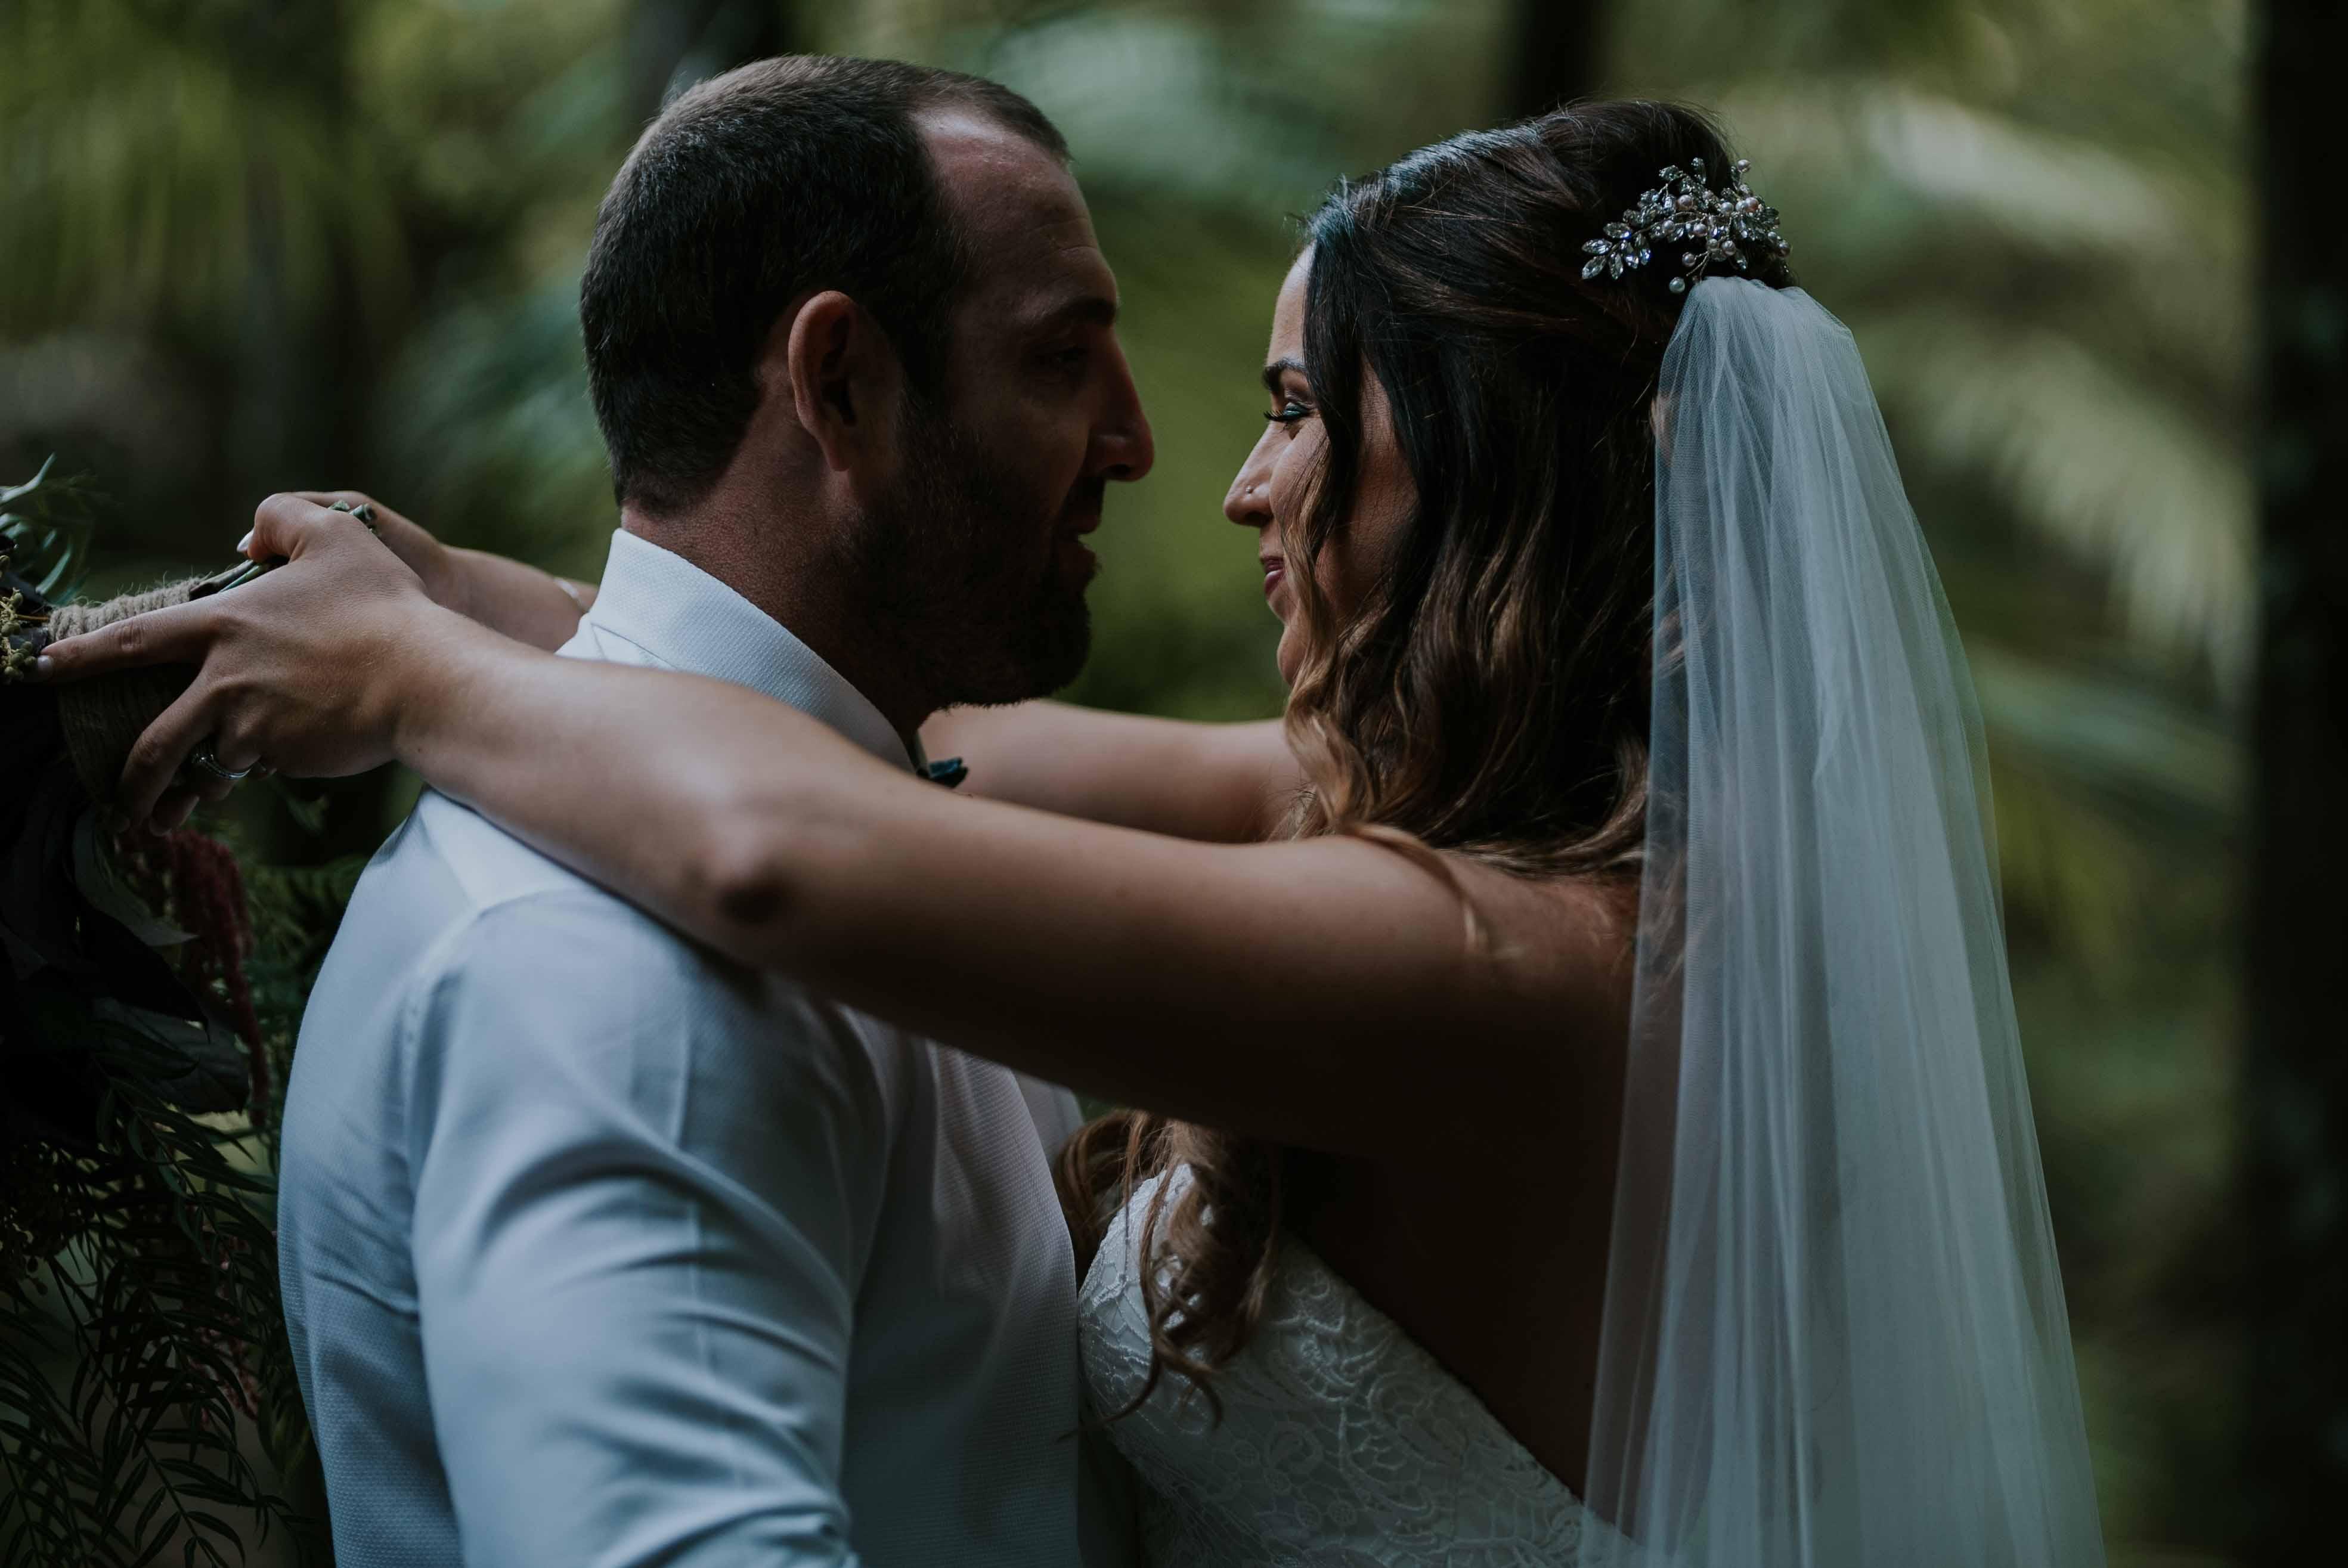 Glen + Hayley | 22/04/2017 | Mt Tamborine Wedding Video | Botanic Gardens, Mount Tamborine, QLD